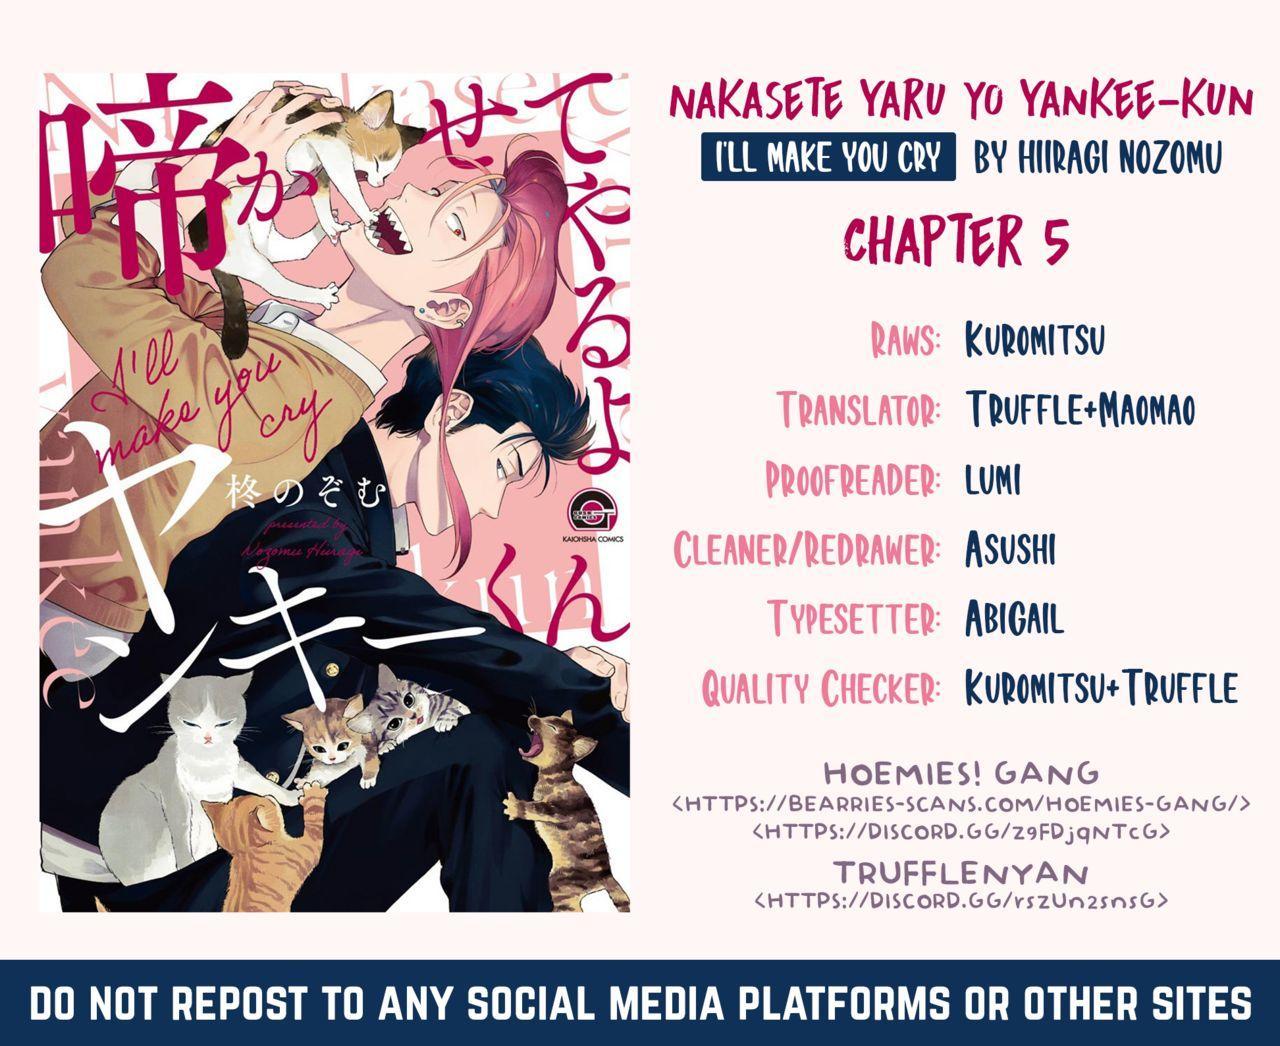 [Hiiragi Nozomu] Nakasete Yaru yo Yankee-kun   I'll Make You Cry Ch. 1-5 + Extras [English] [Digital] 156